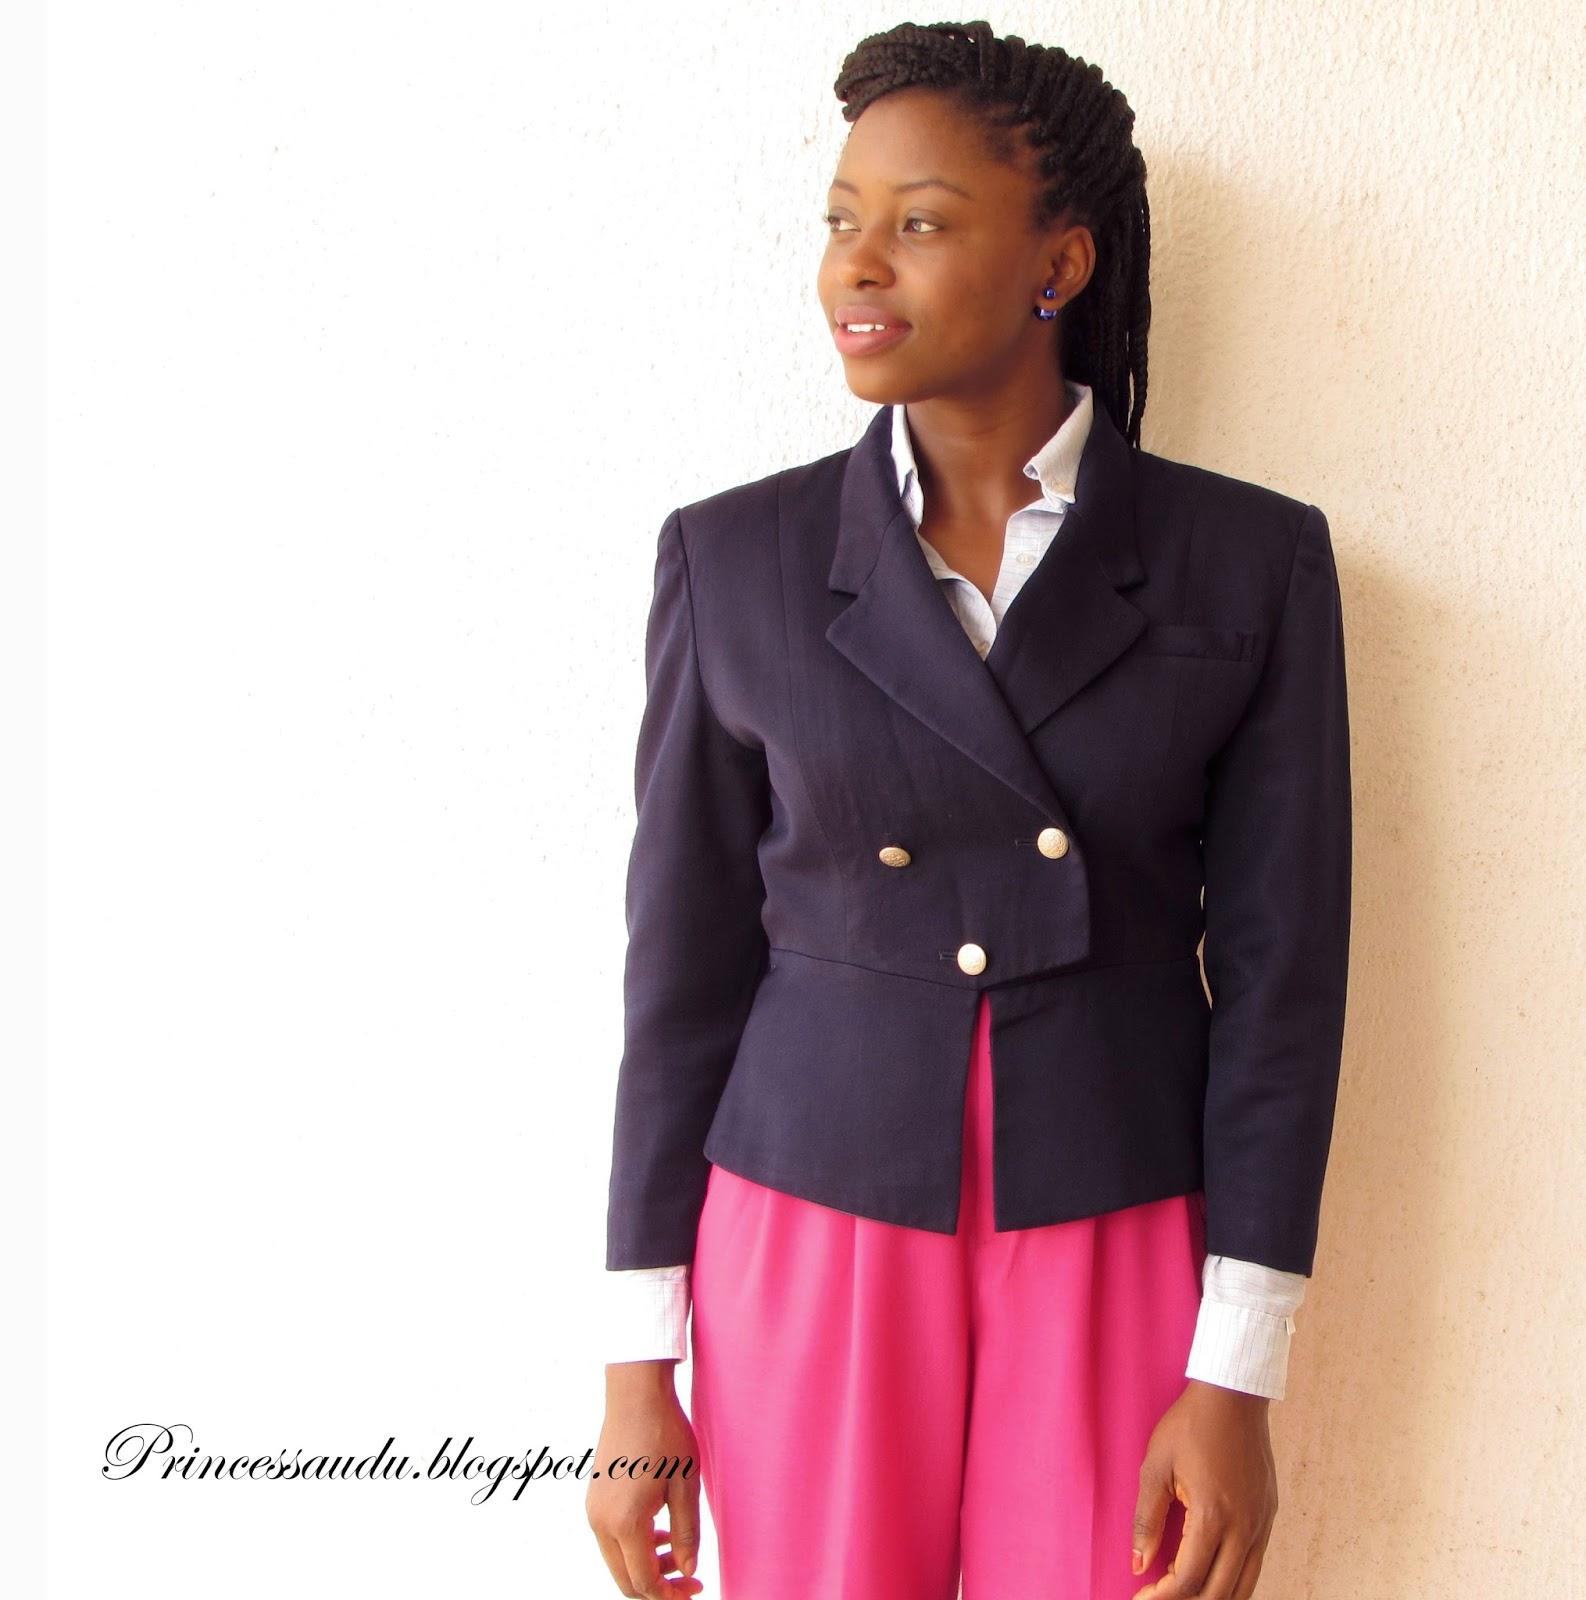 Vintage structured blazer, high-waist trousers, white pumps, work inspiration, workwear, pink trousers, blazer